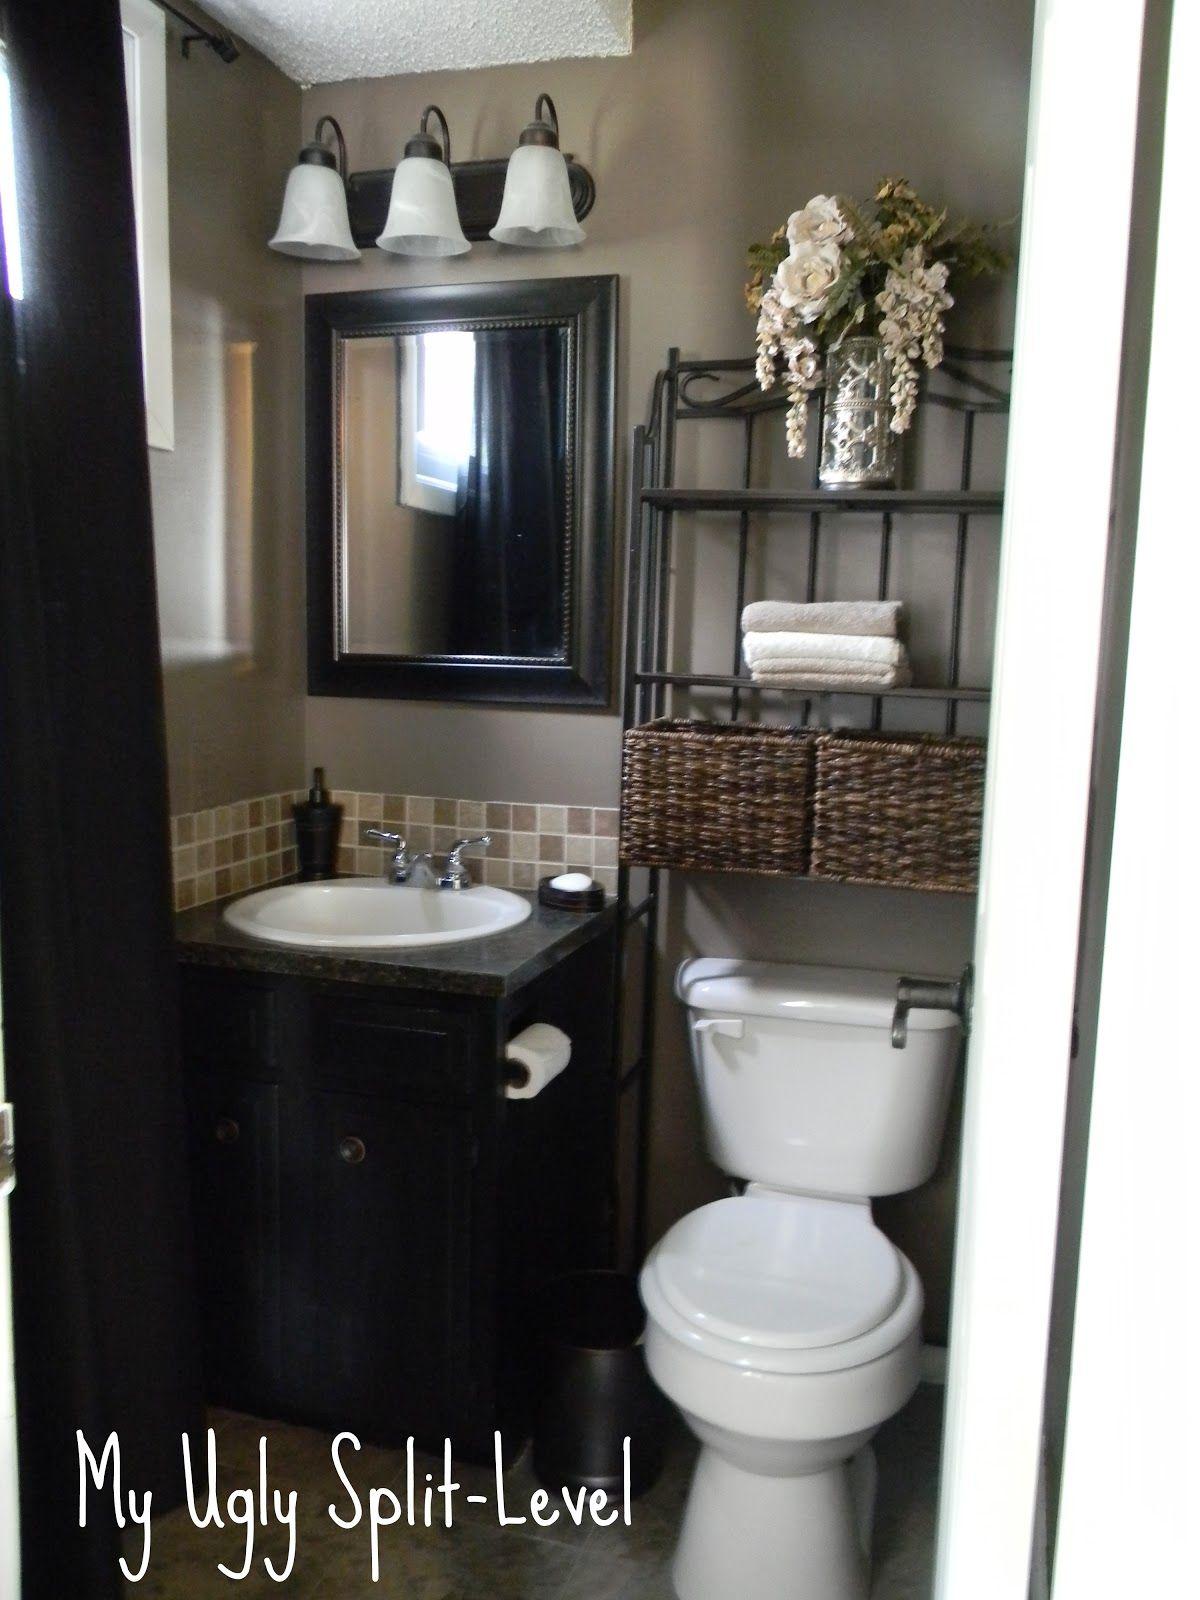 My Bathroom Remodel Love It Kohls: My Ugly Split-level: November 2012